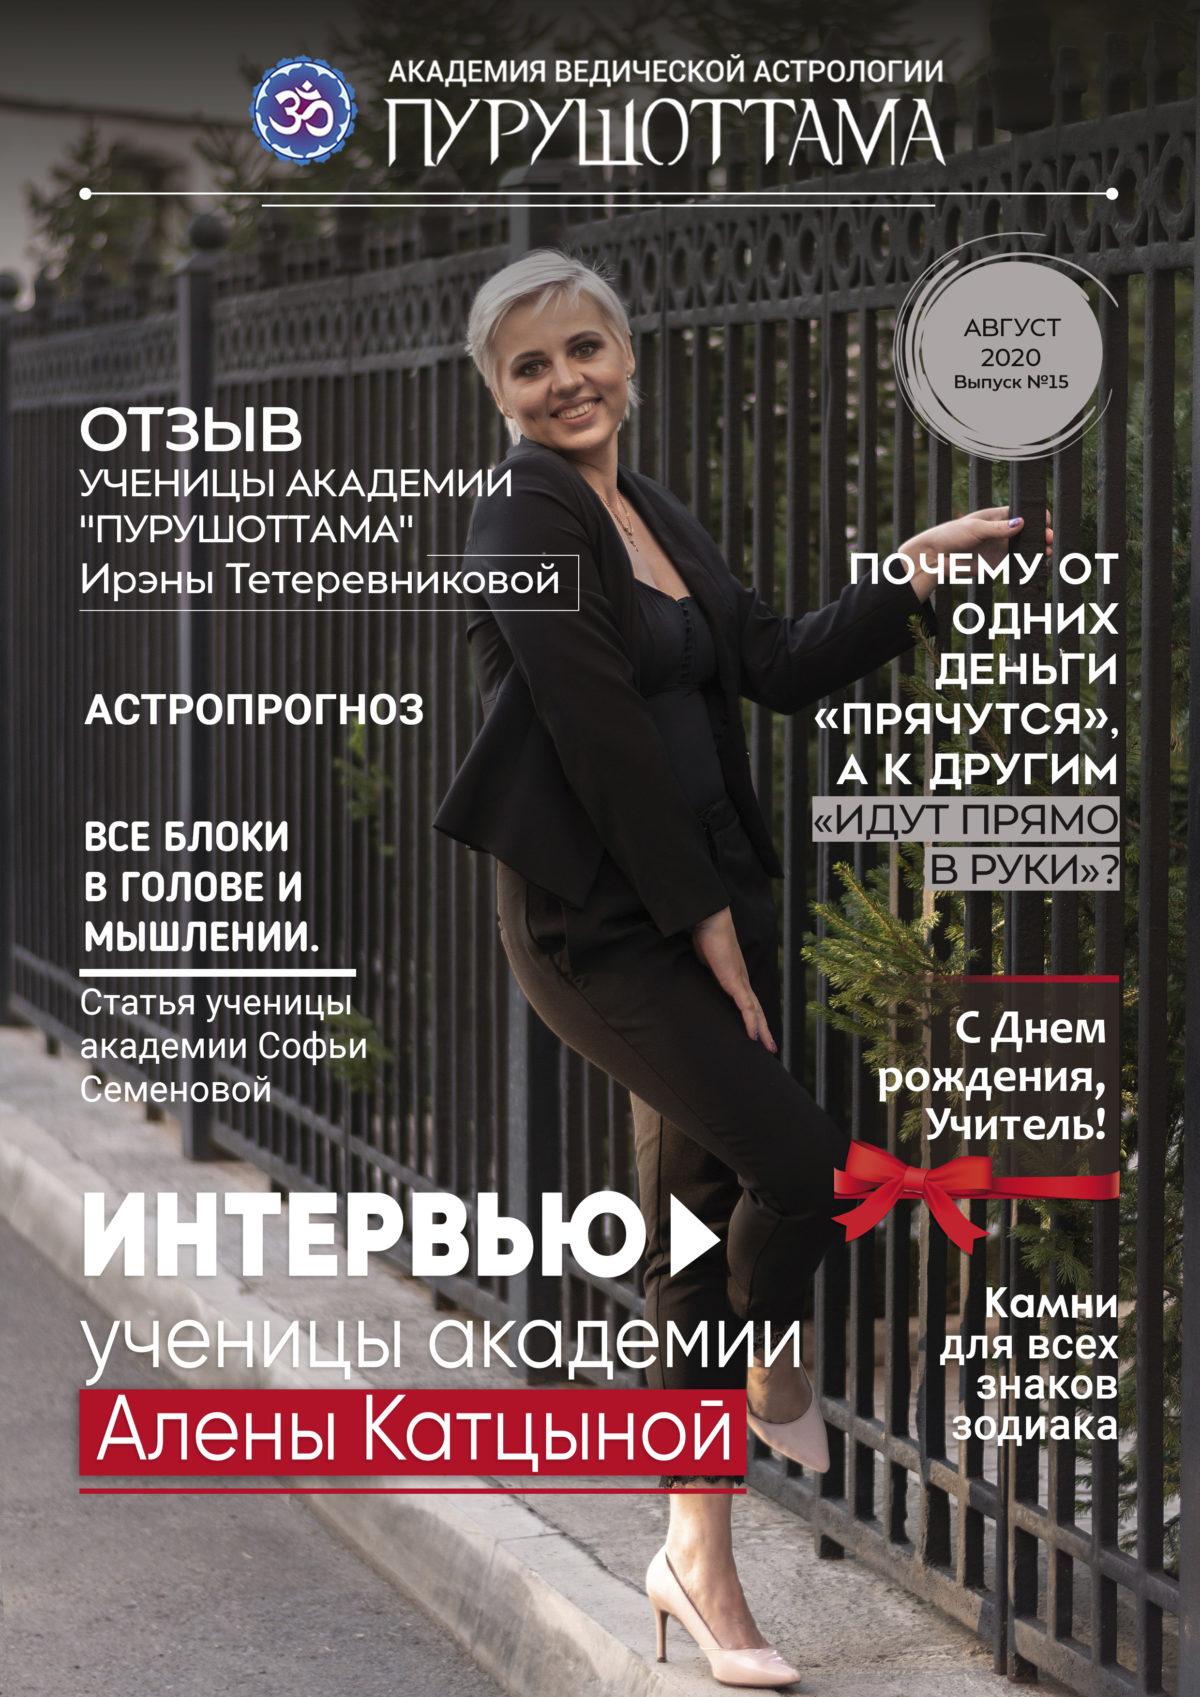 Новый номер журнала Академии «Пурушоттама». Август